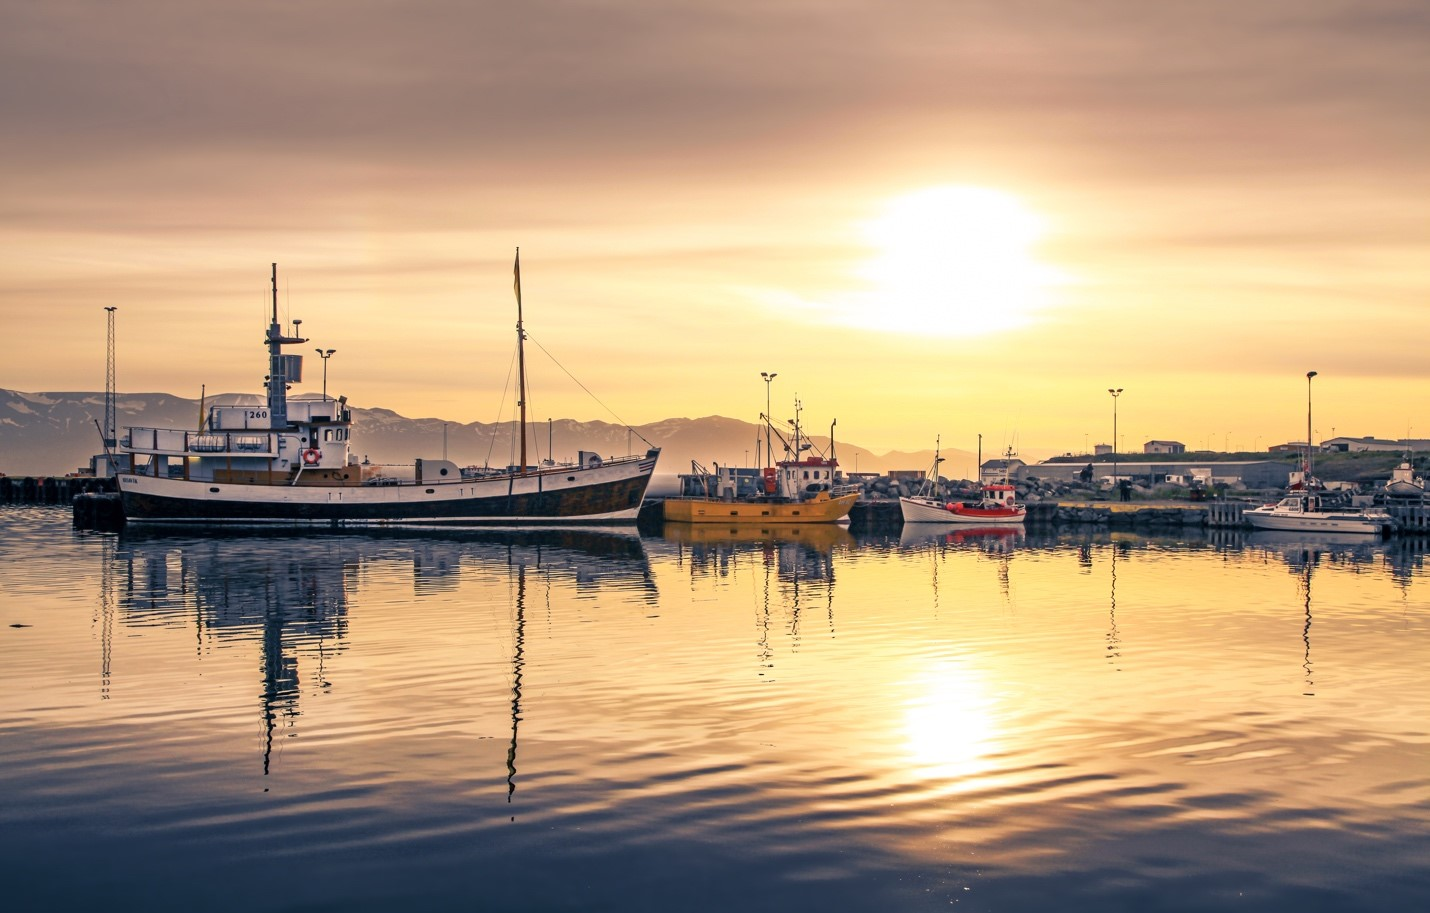 Fishing in Iceland - Reykjavík Outventure - Iceland Tours